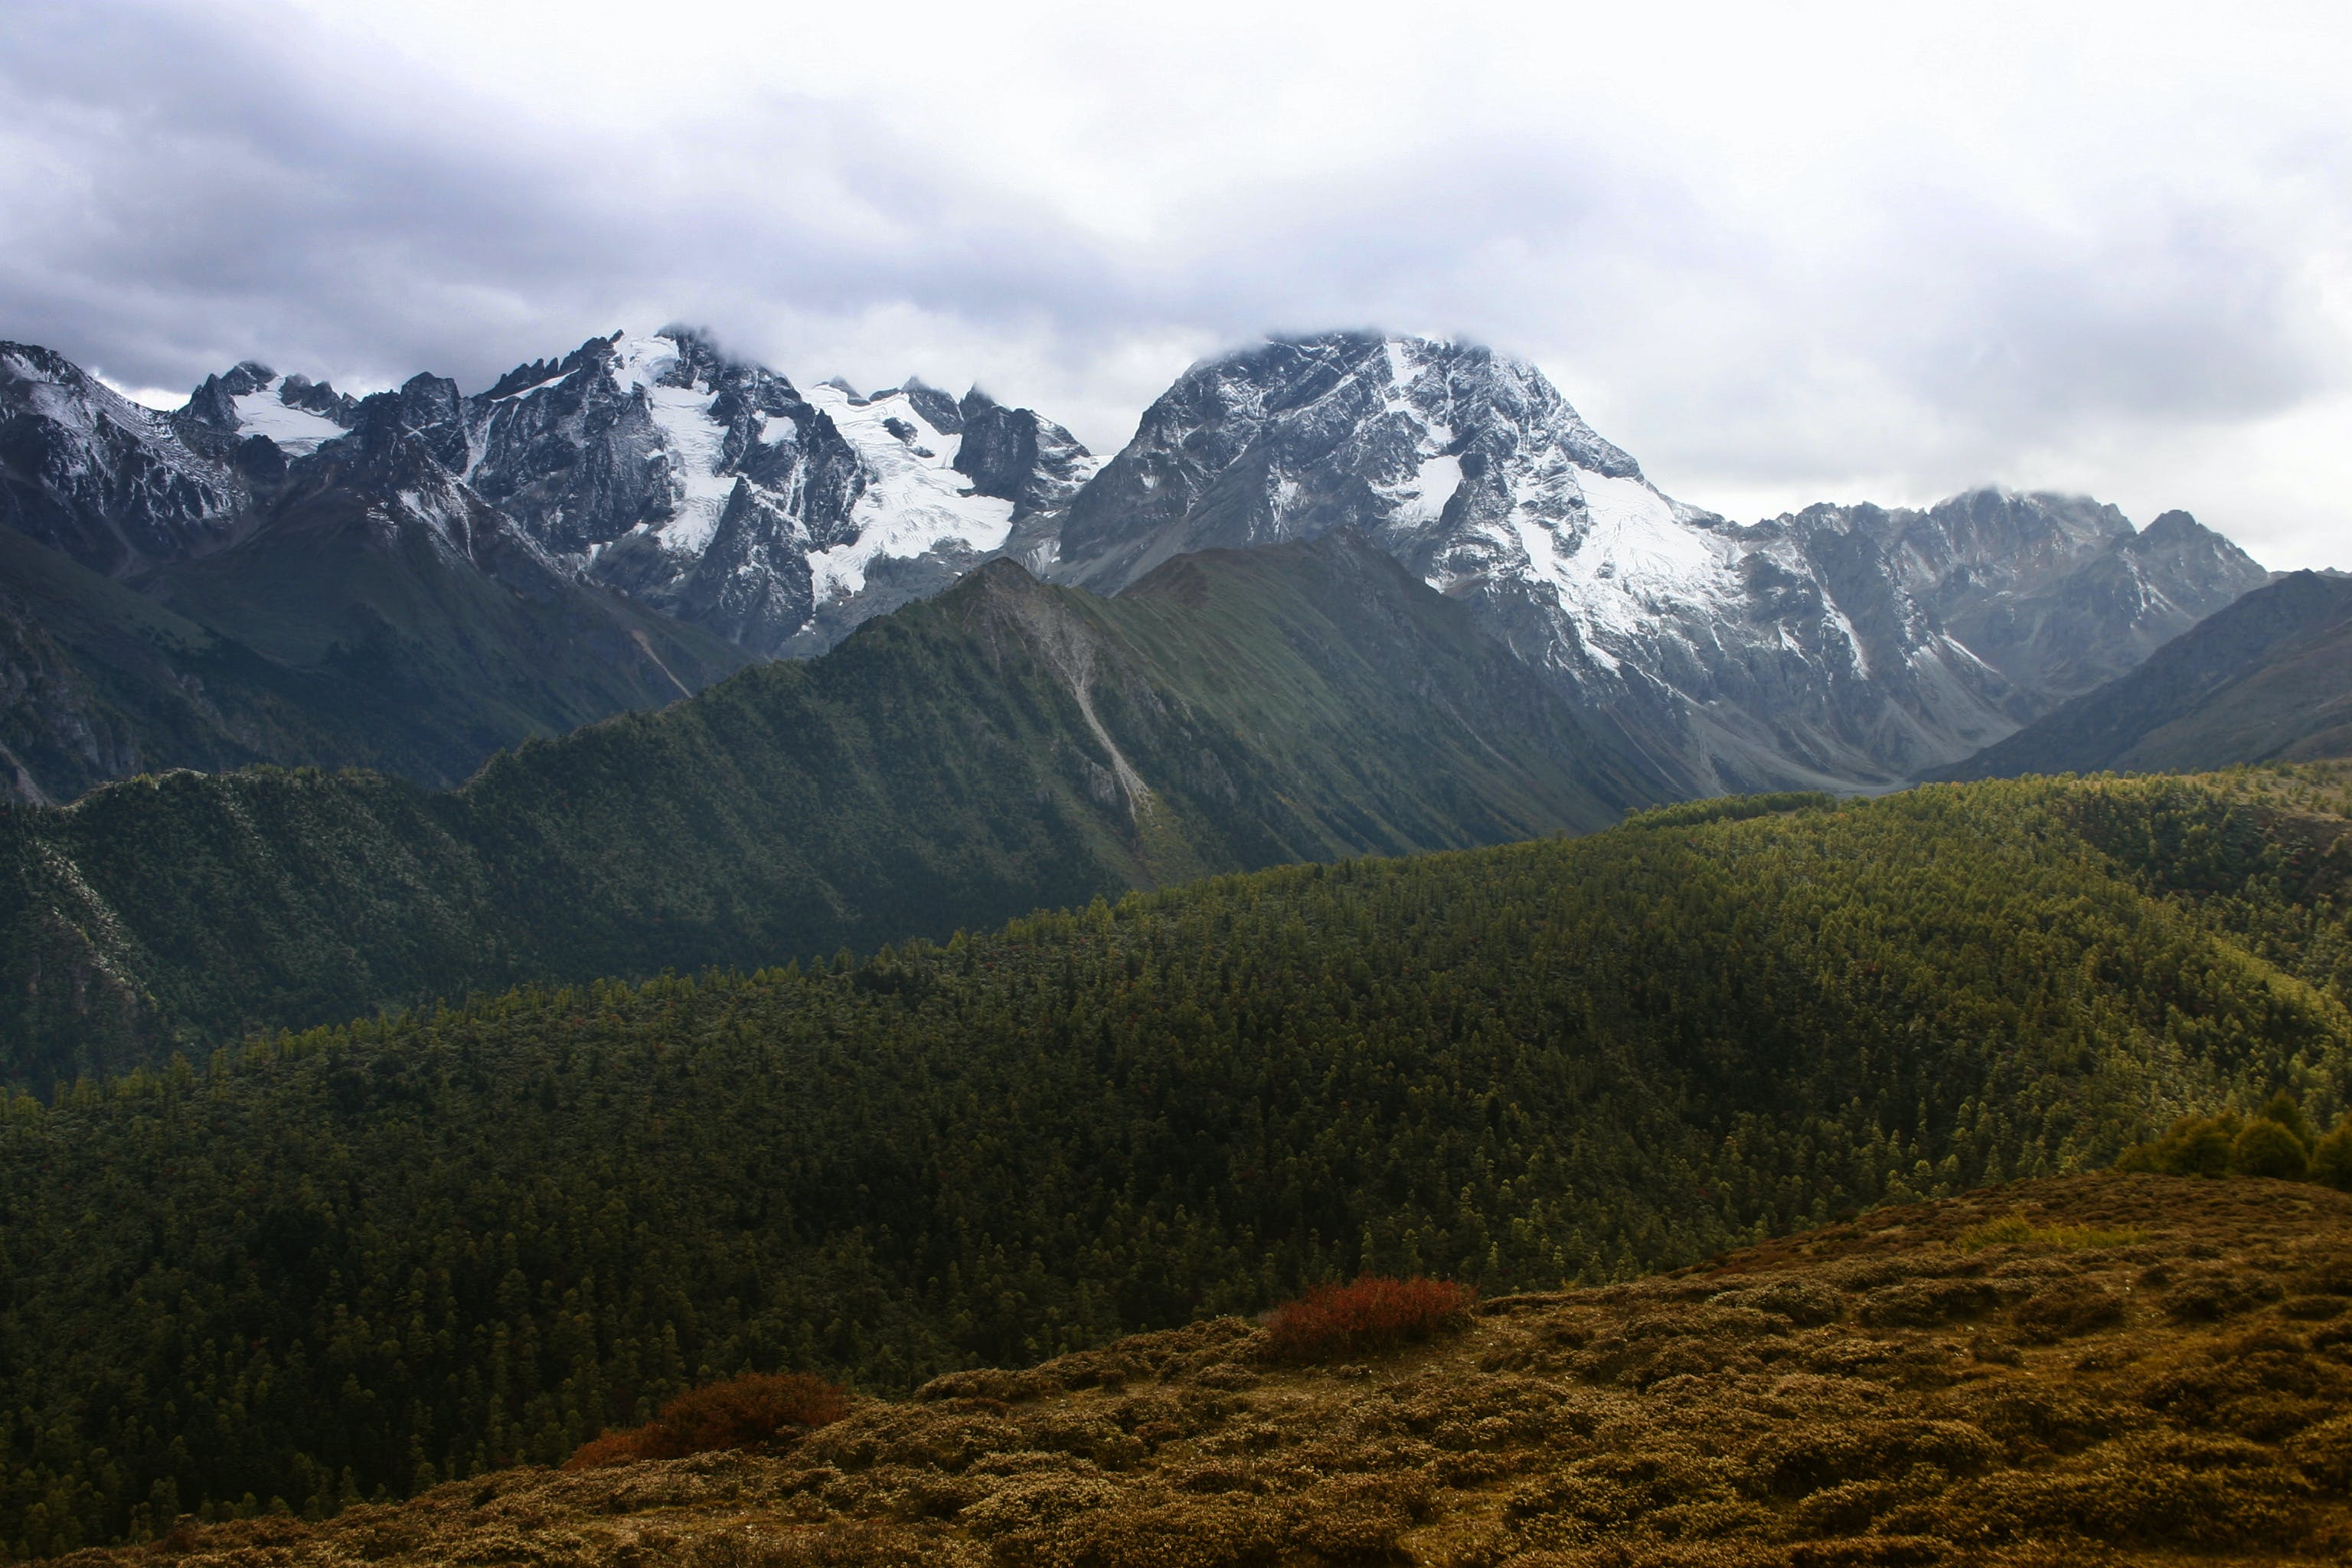 Mountain With Snow Caps